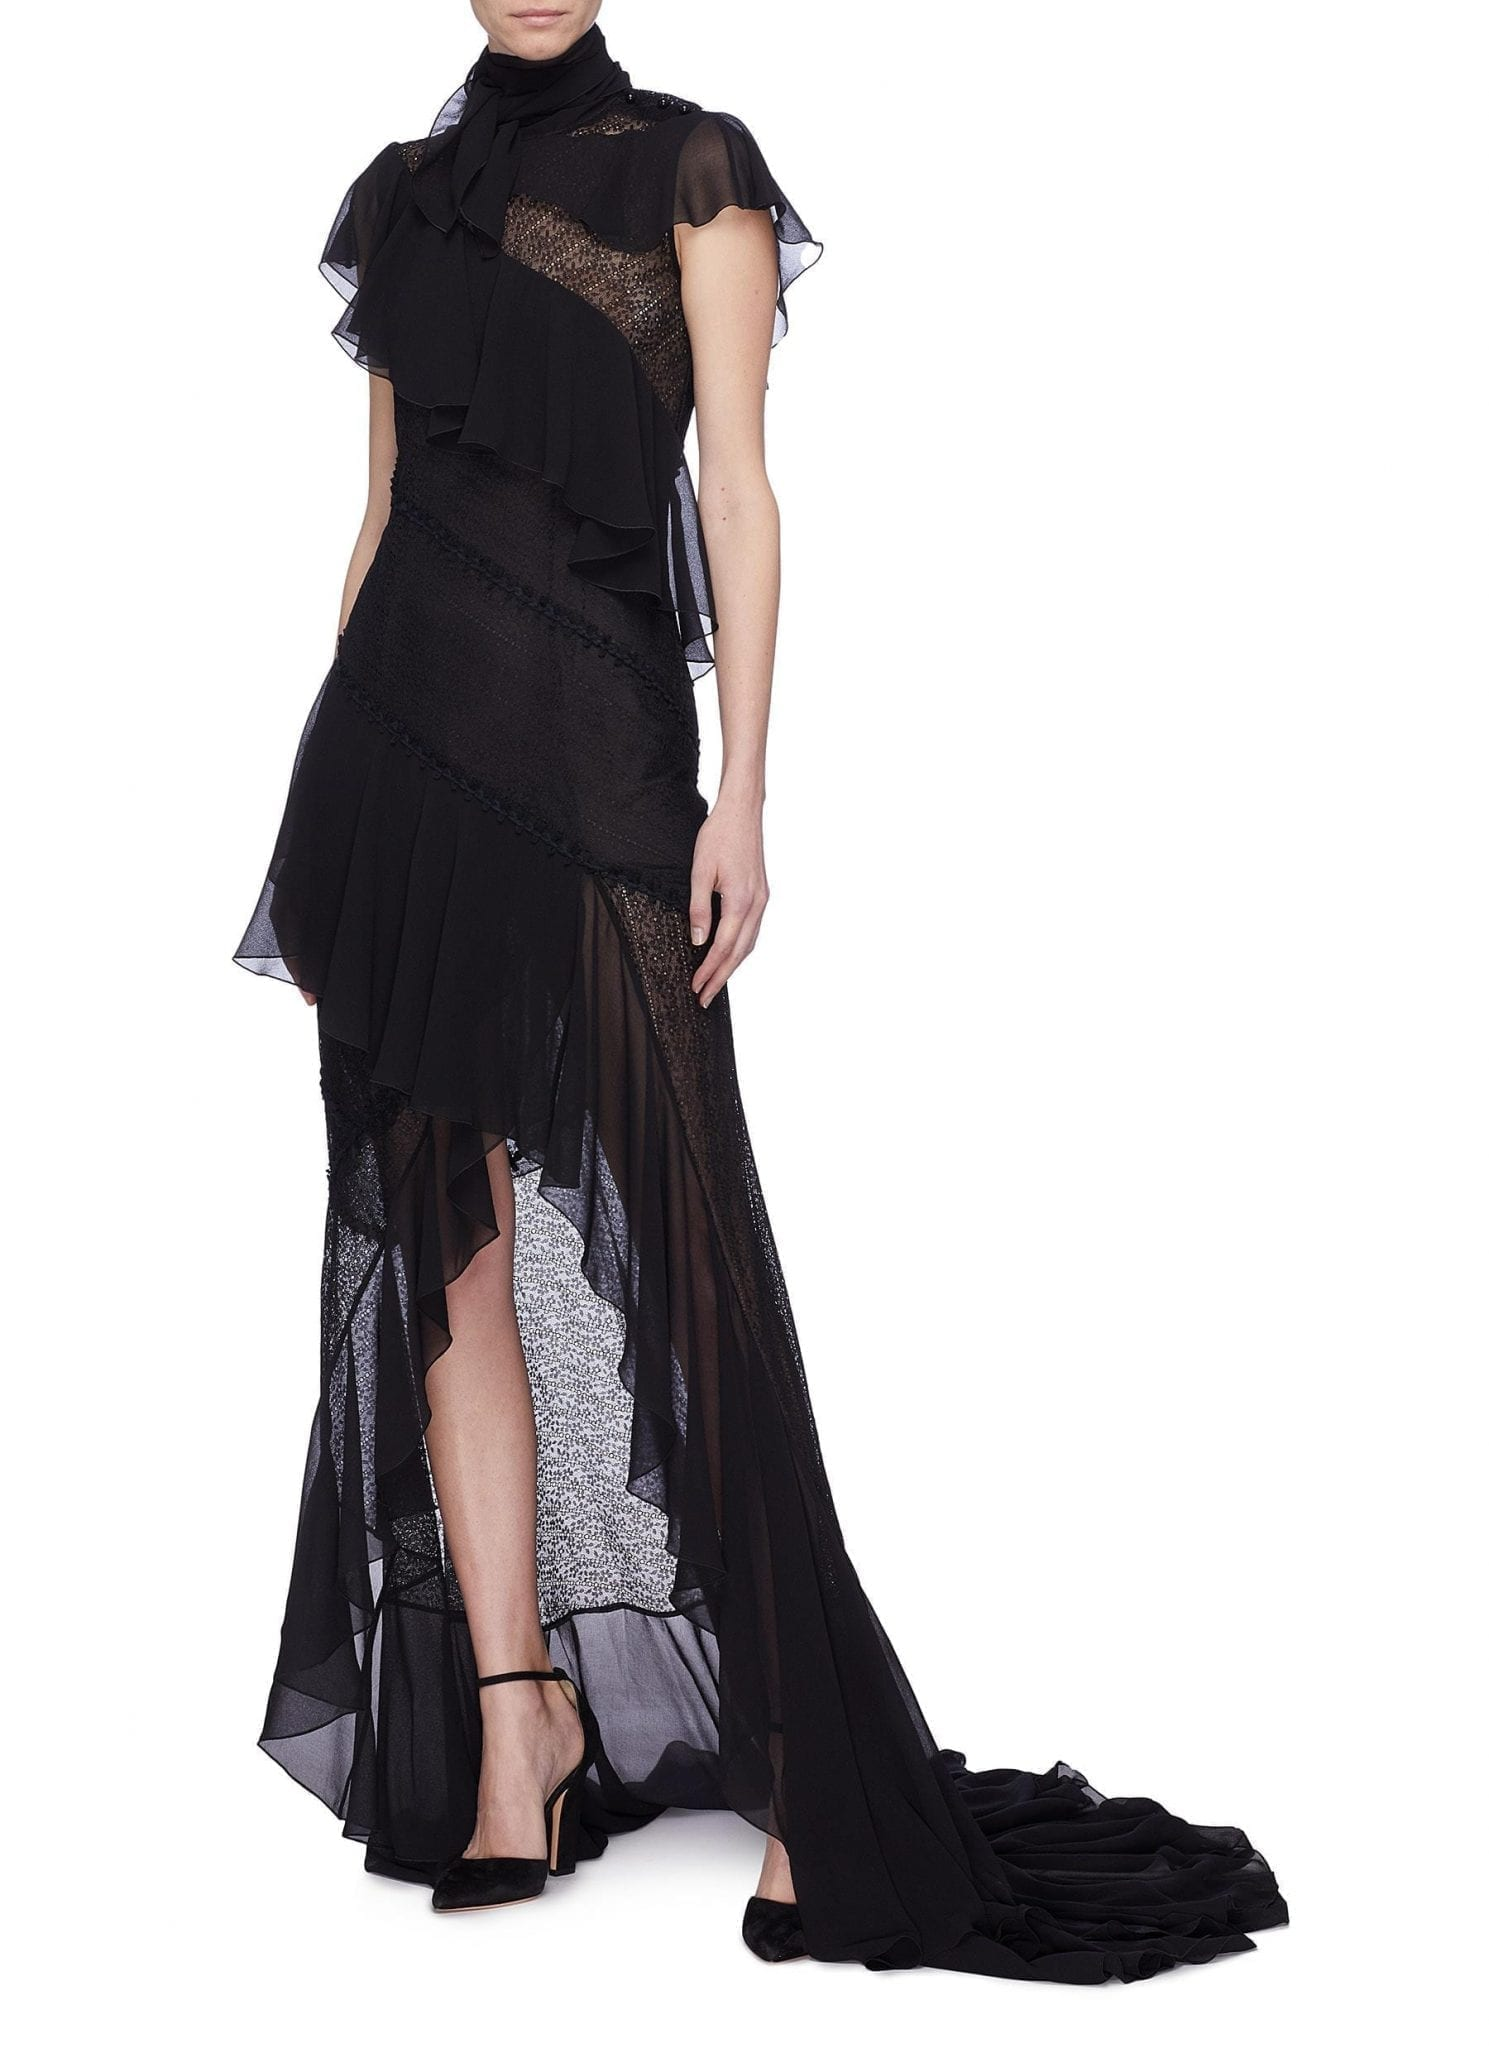 PHILOSOPHY DI LORENZO SERAFINI Sash Tie Neck Ruffle Tiered High-low Black Dress